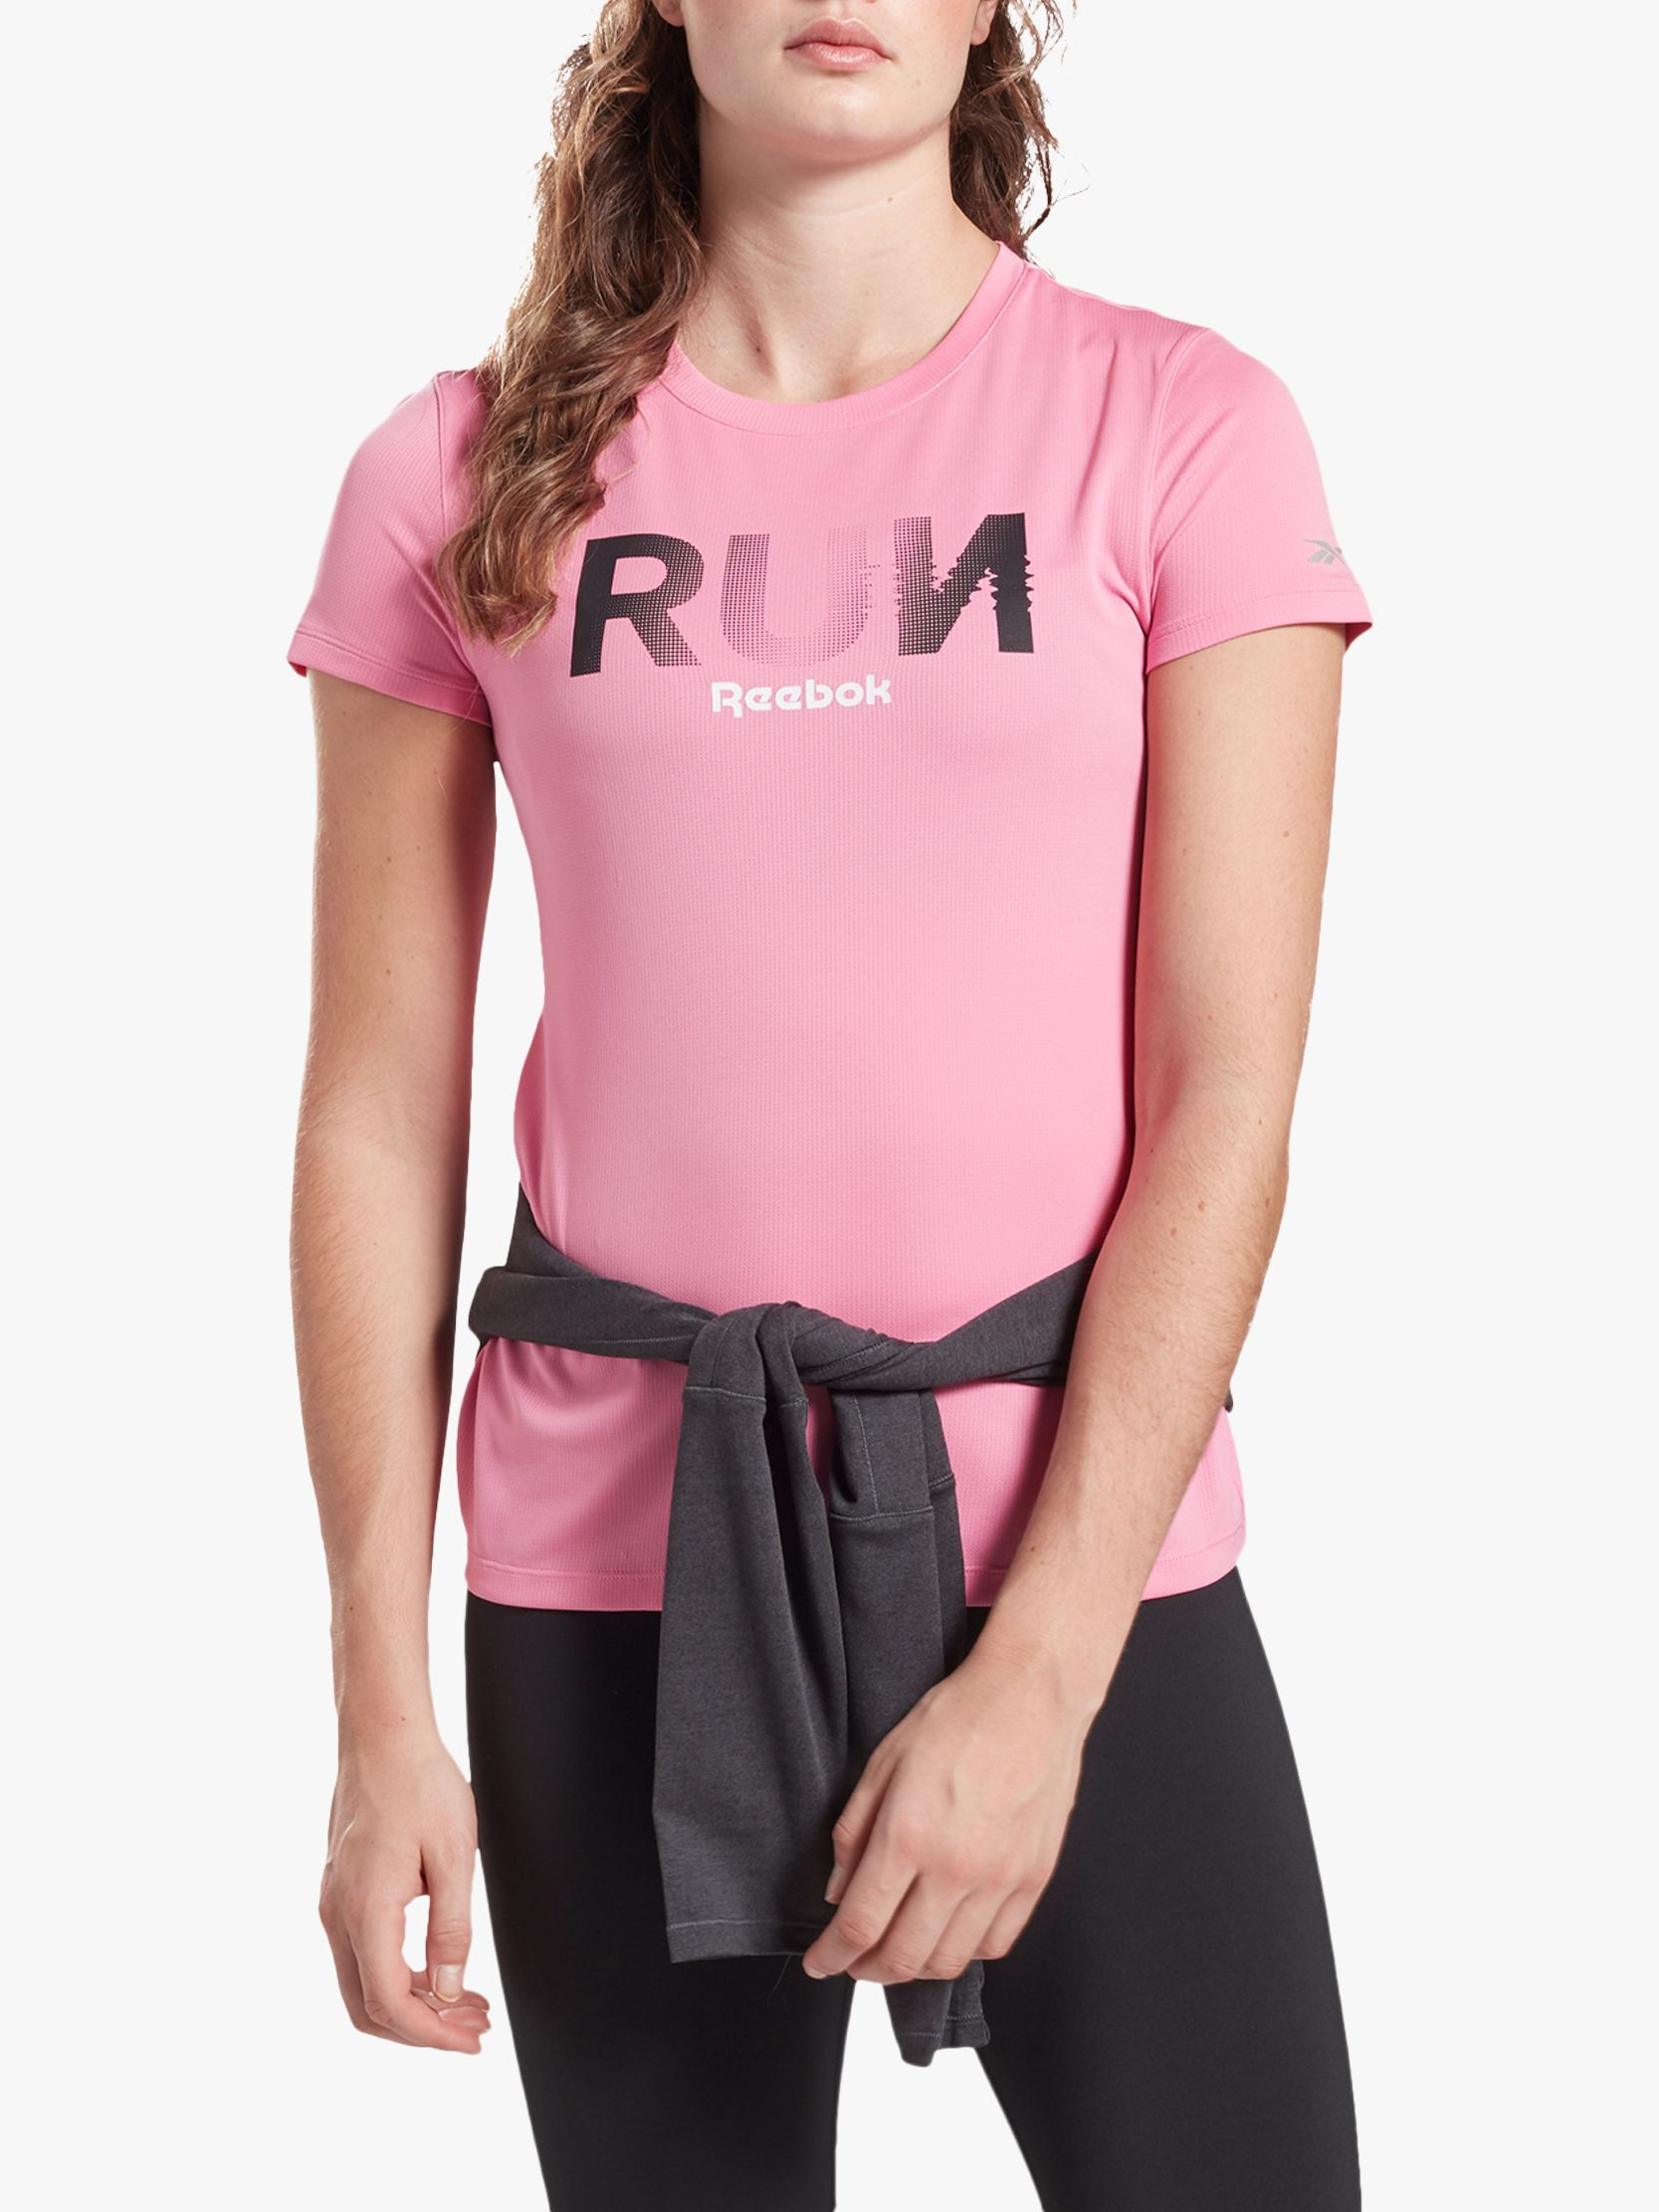 Reebok Reebok Running Essentials Short Sleeve Running Top, Posh Pink